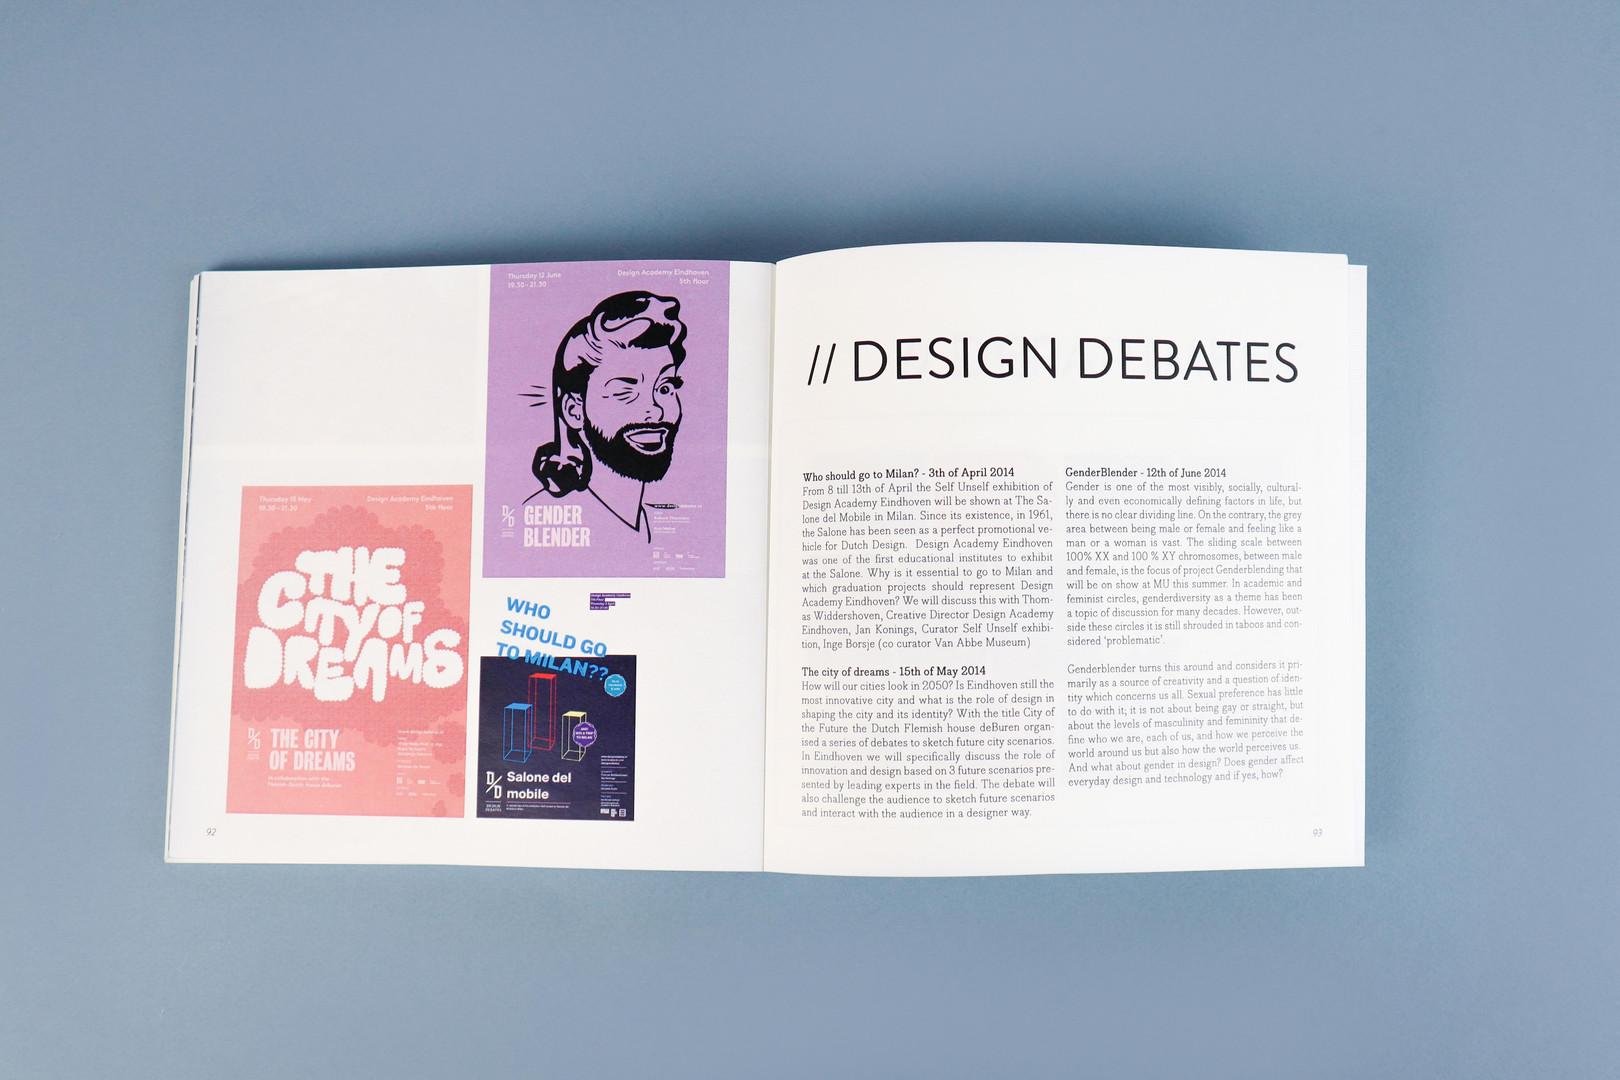 Processbook design debates